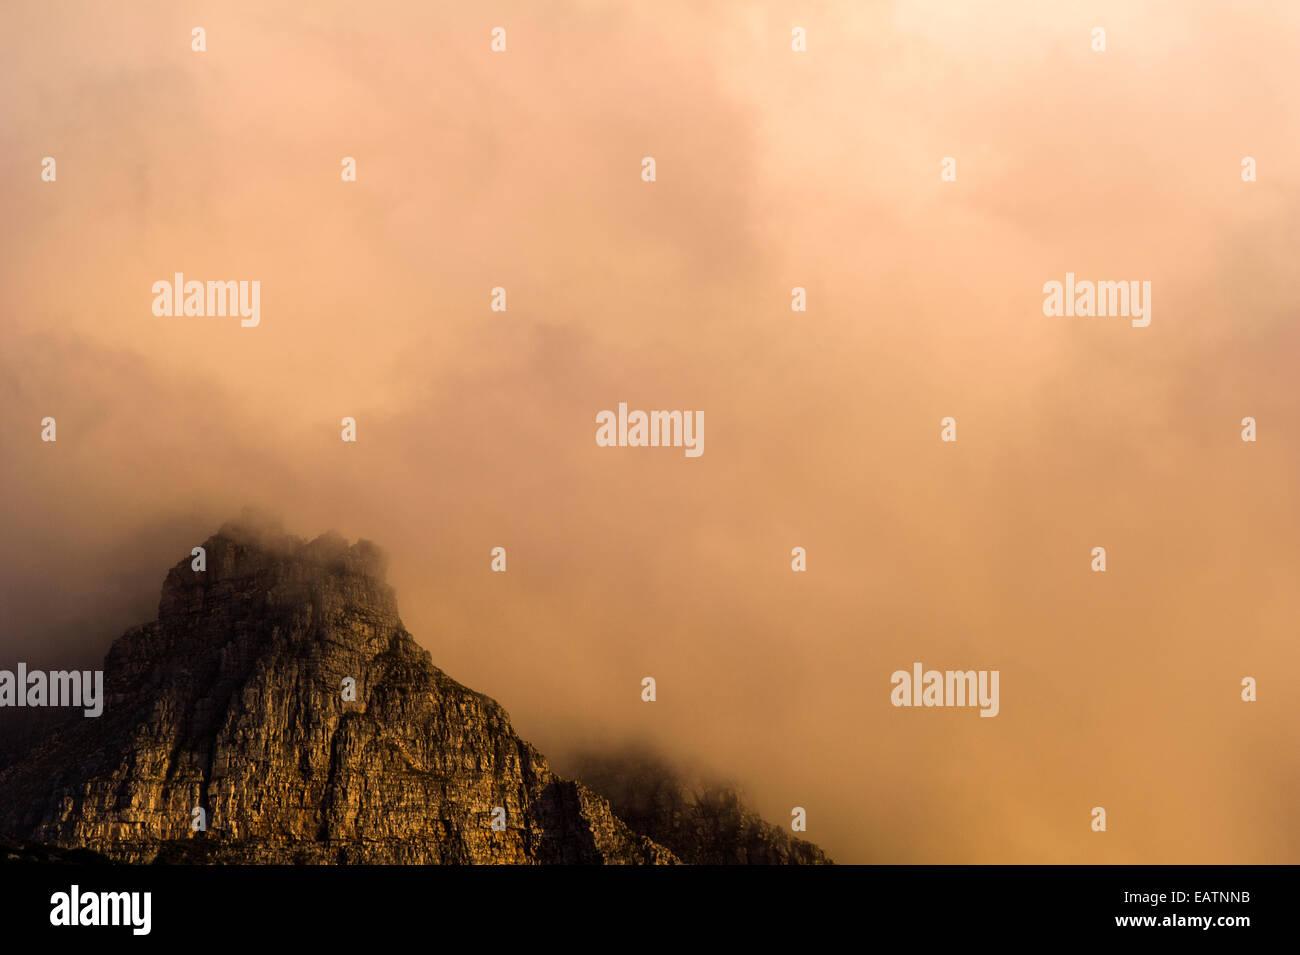 Menacing sunset storm clouds consume a rugged coastal mountain range. - Stock Image